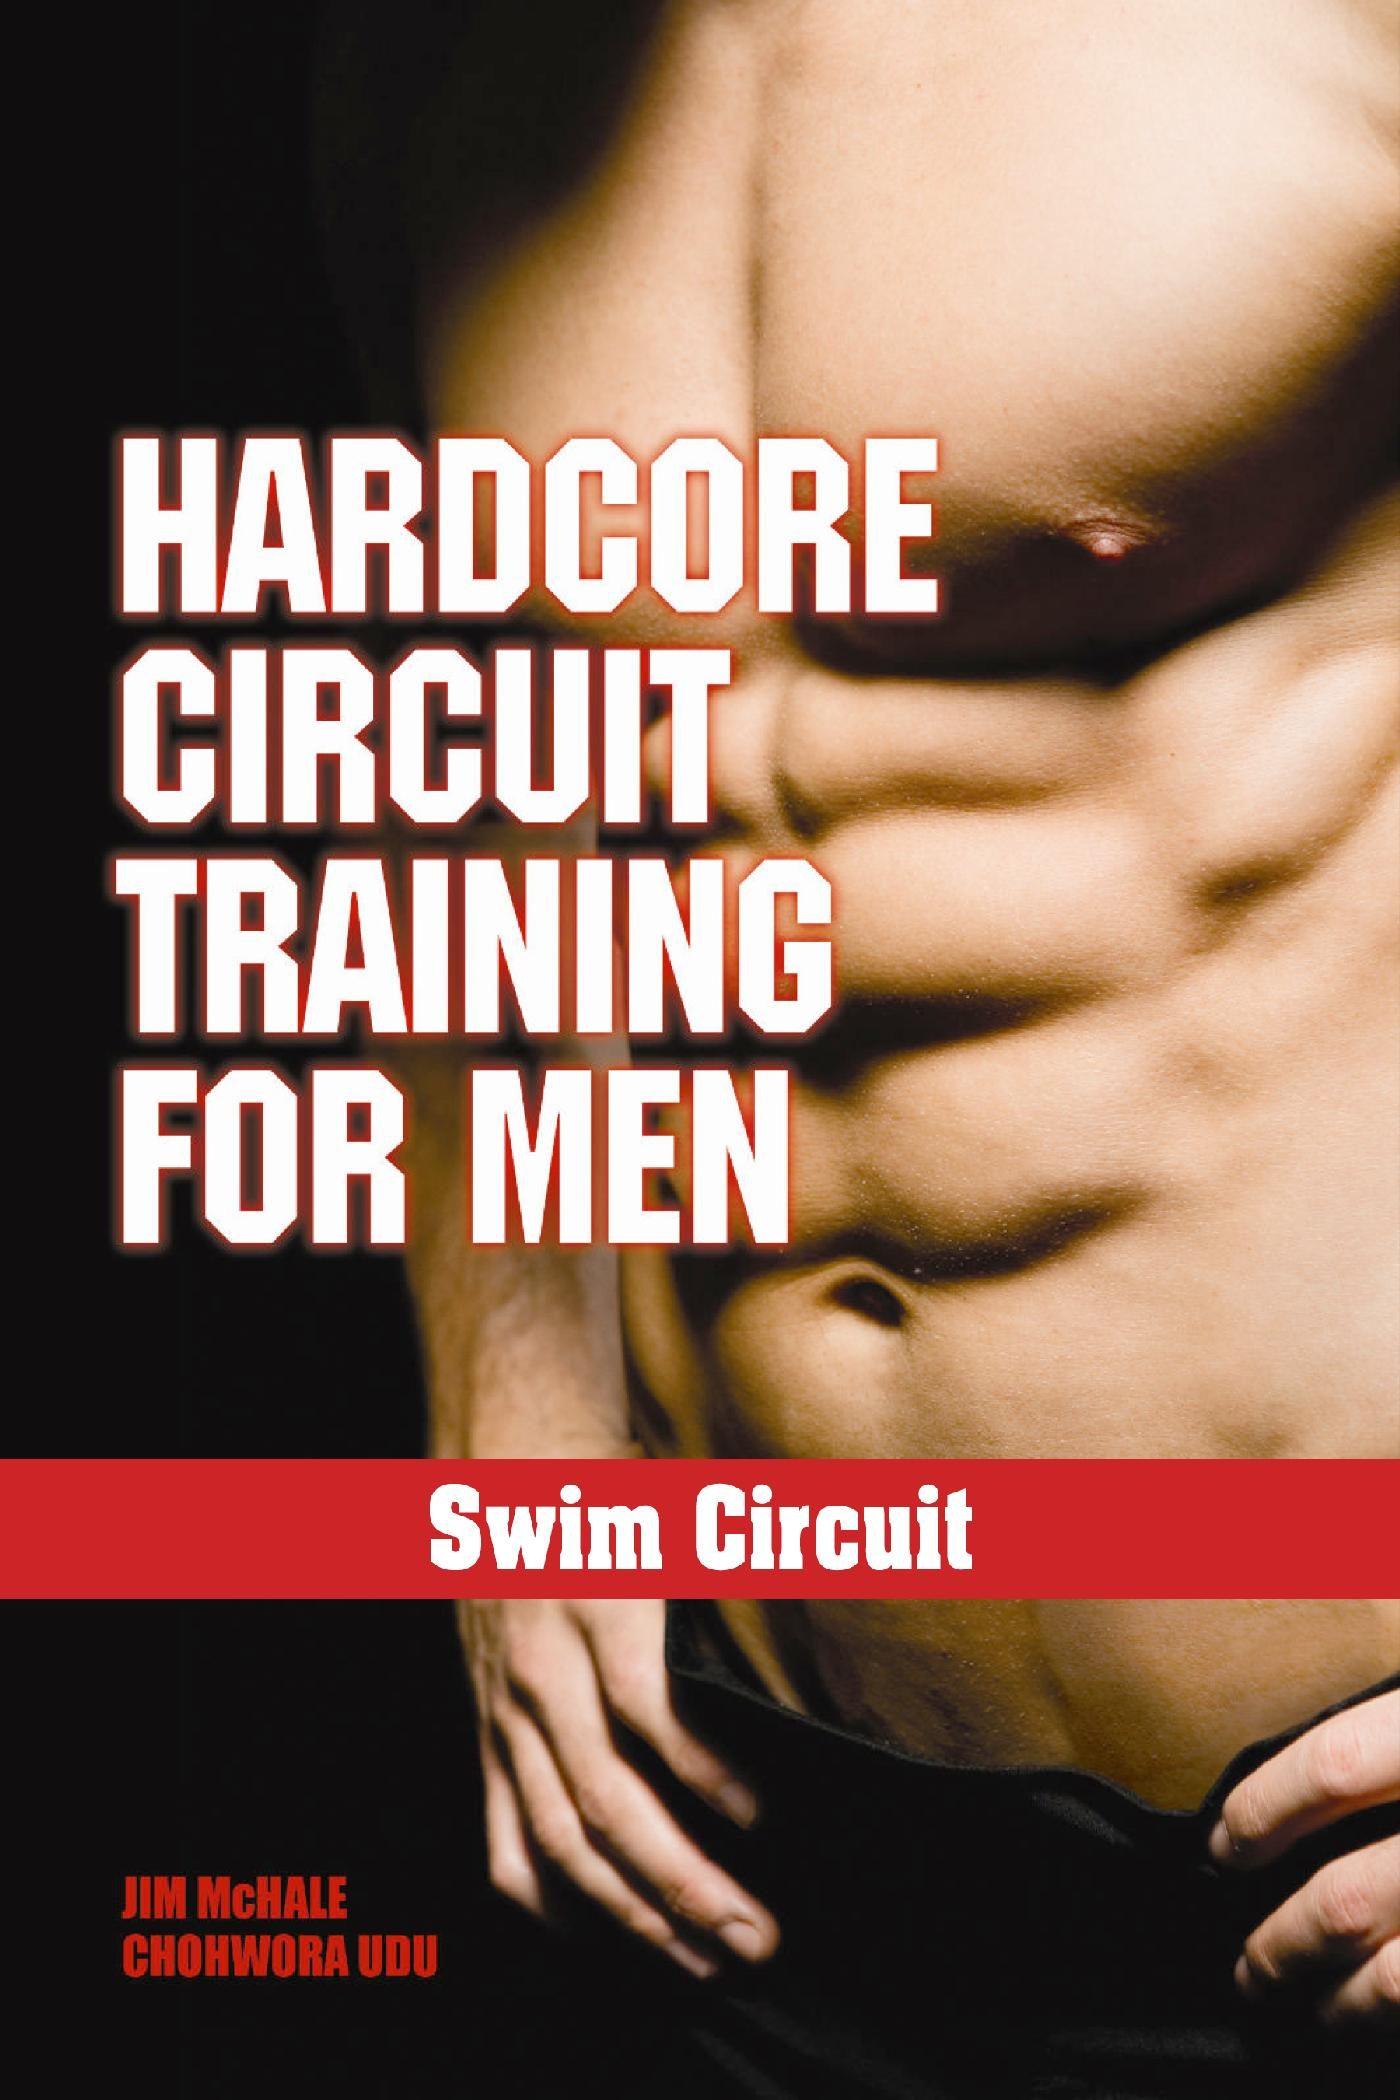 Hardcore Circuit Training For Men   por Chohwora Udu, James H. Mchale epub